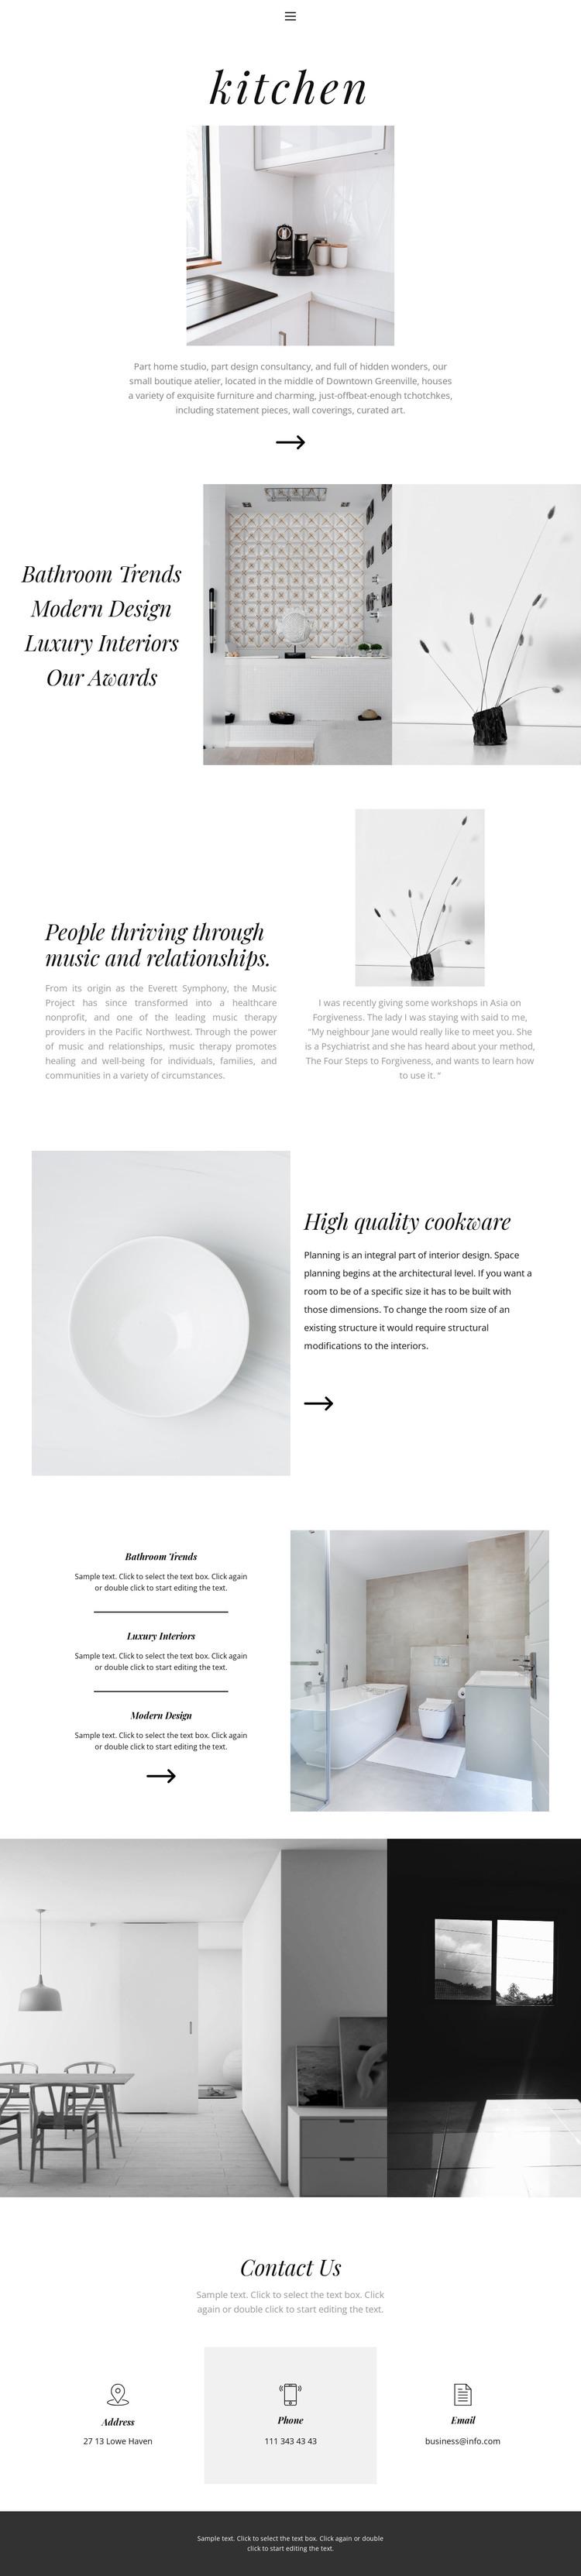 Turnkey interior Web Design